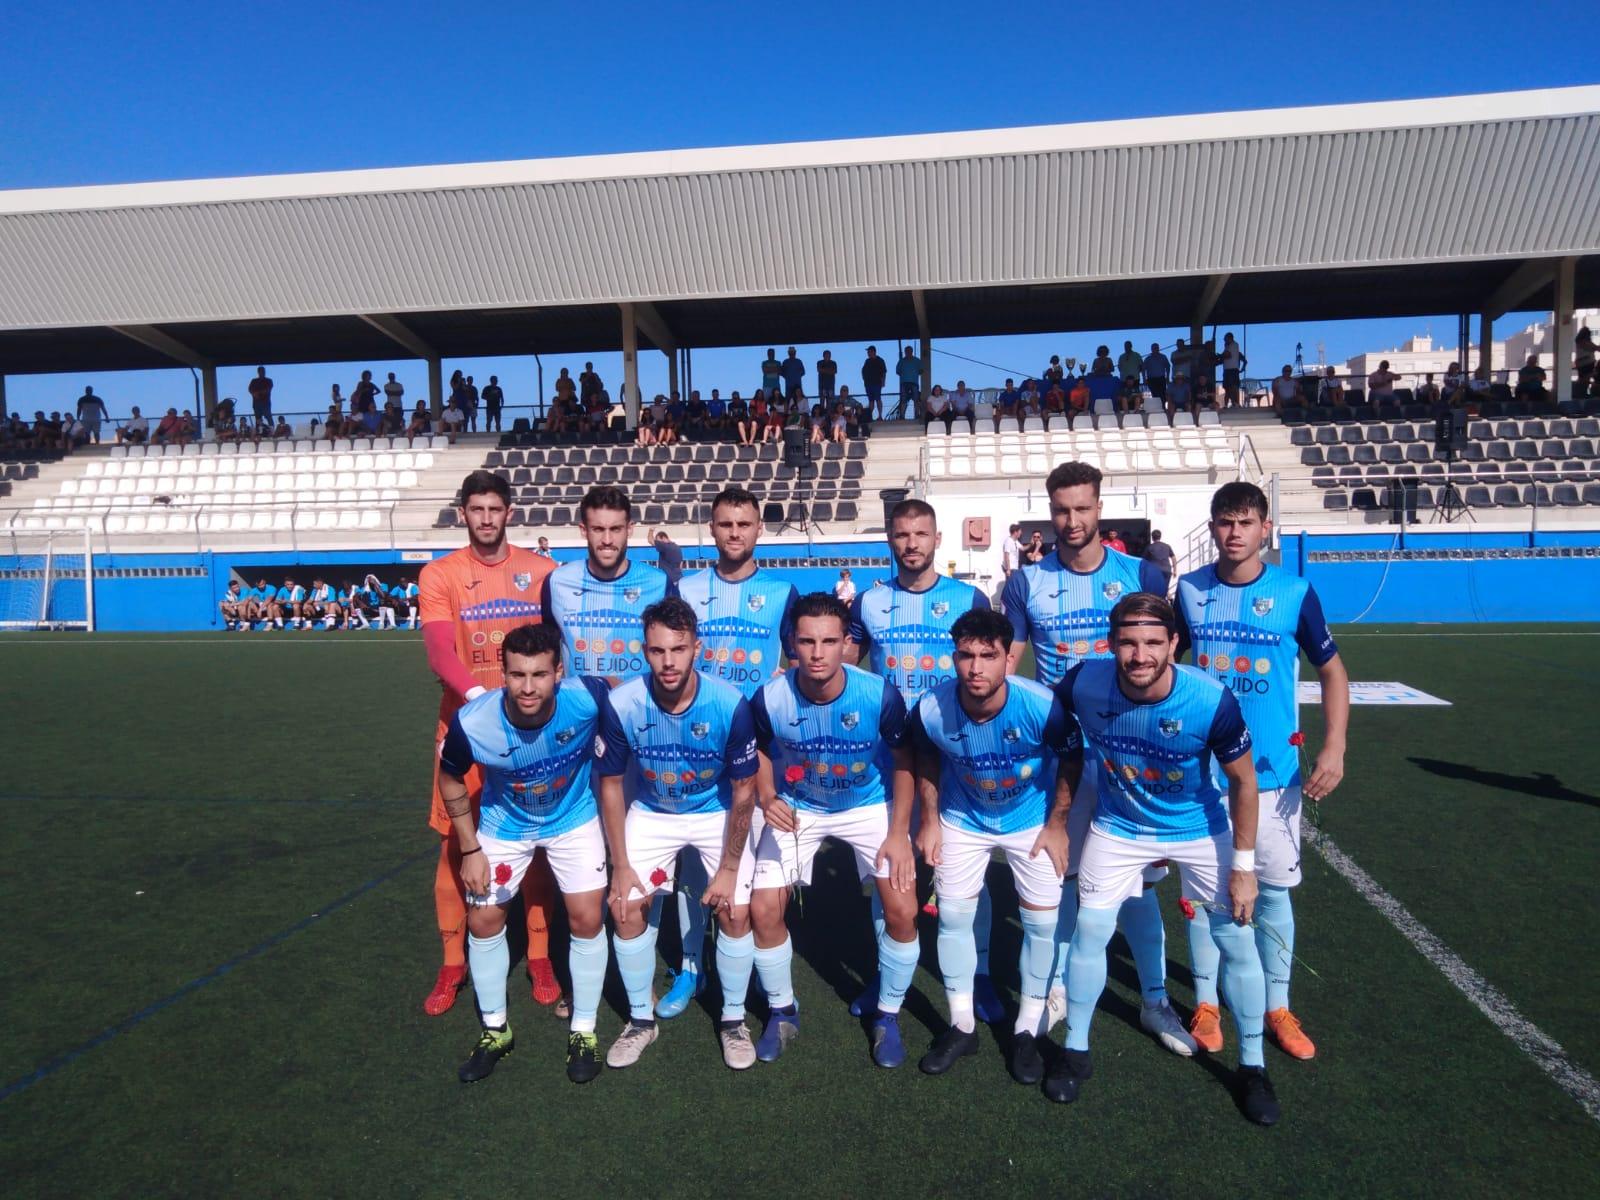 Doble victoria para triunfar en el 60 Trofeo Villa de Garrucha